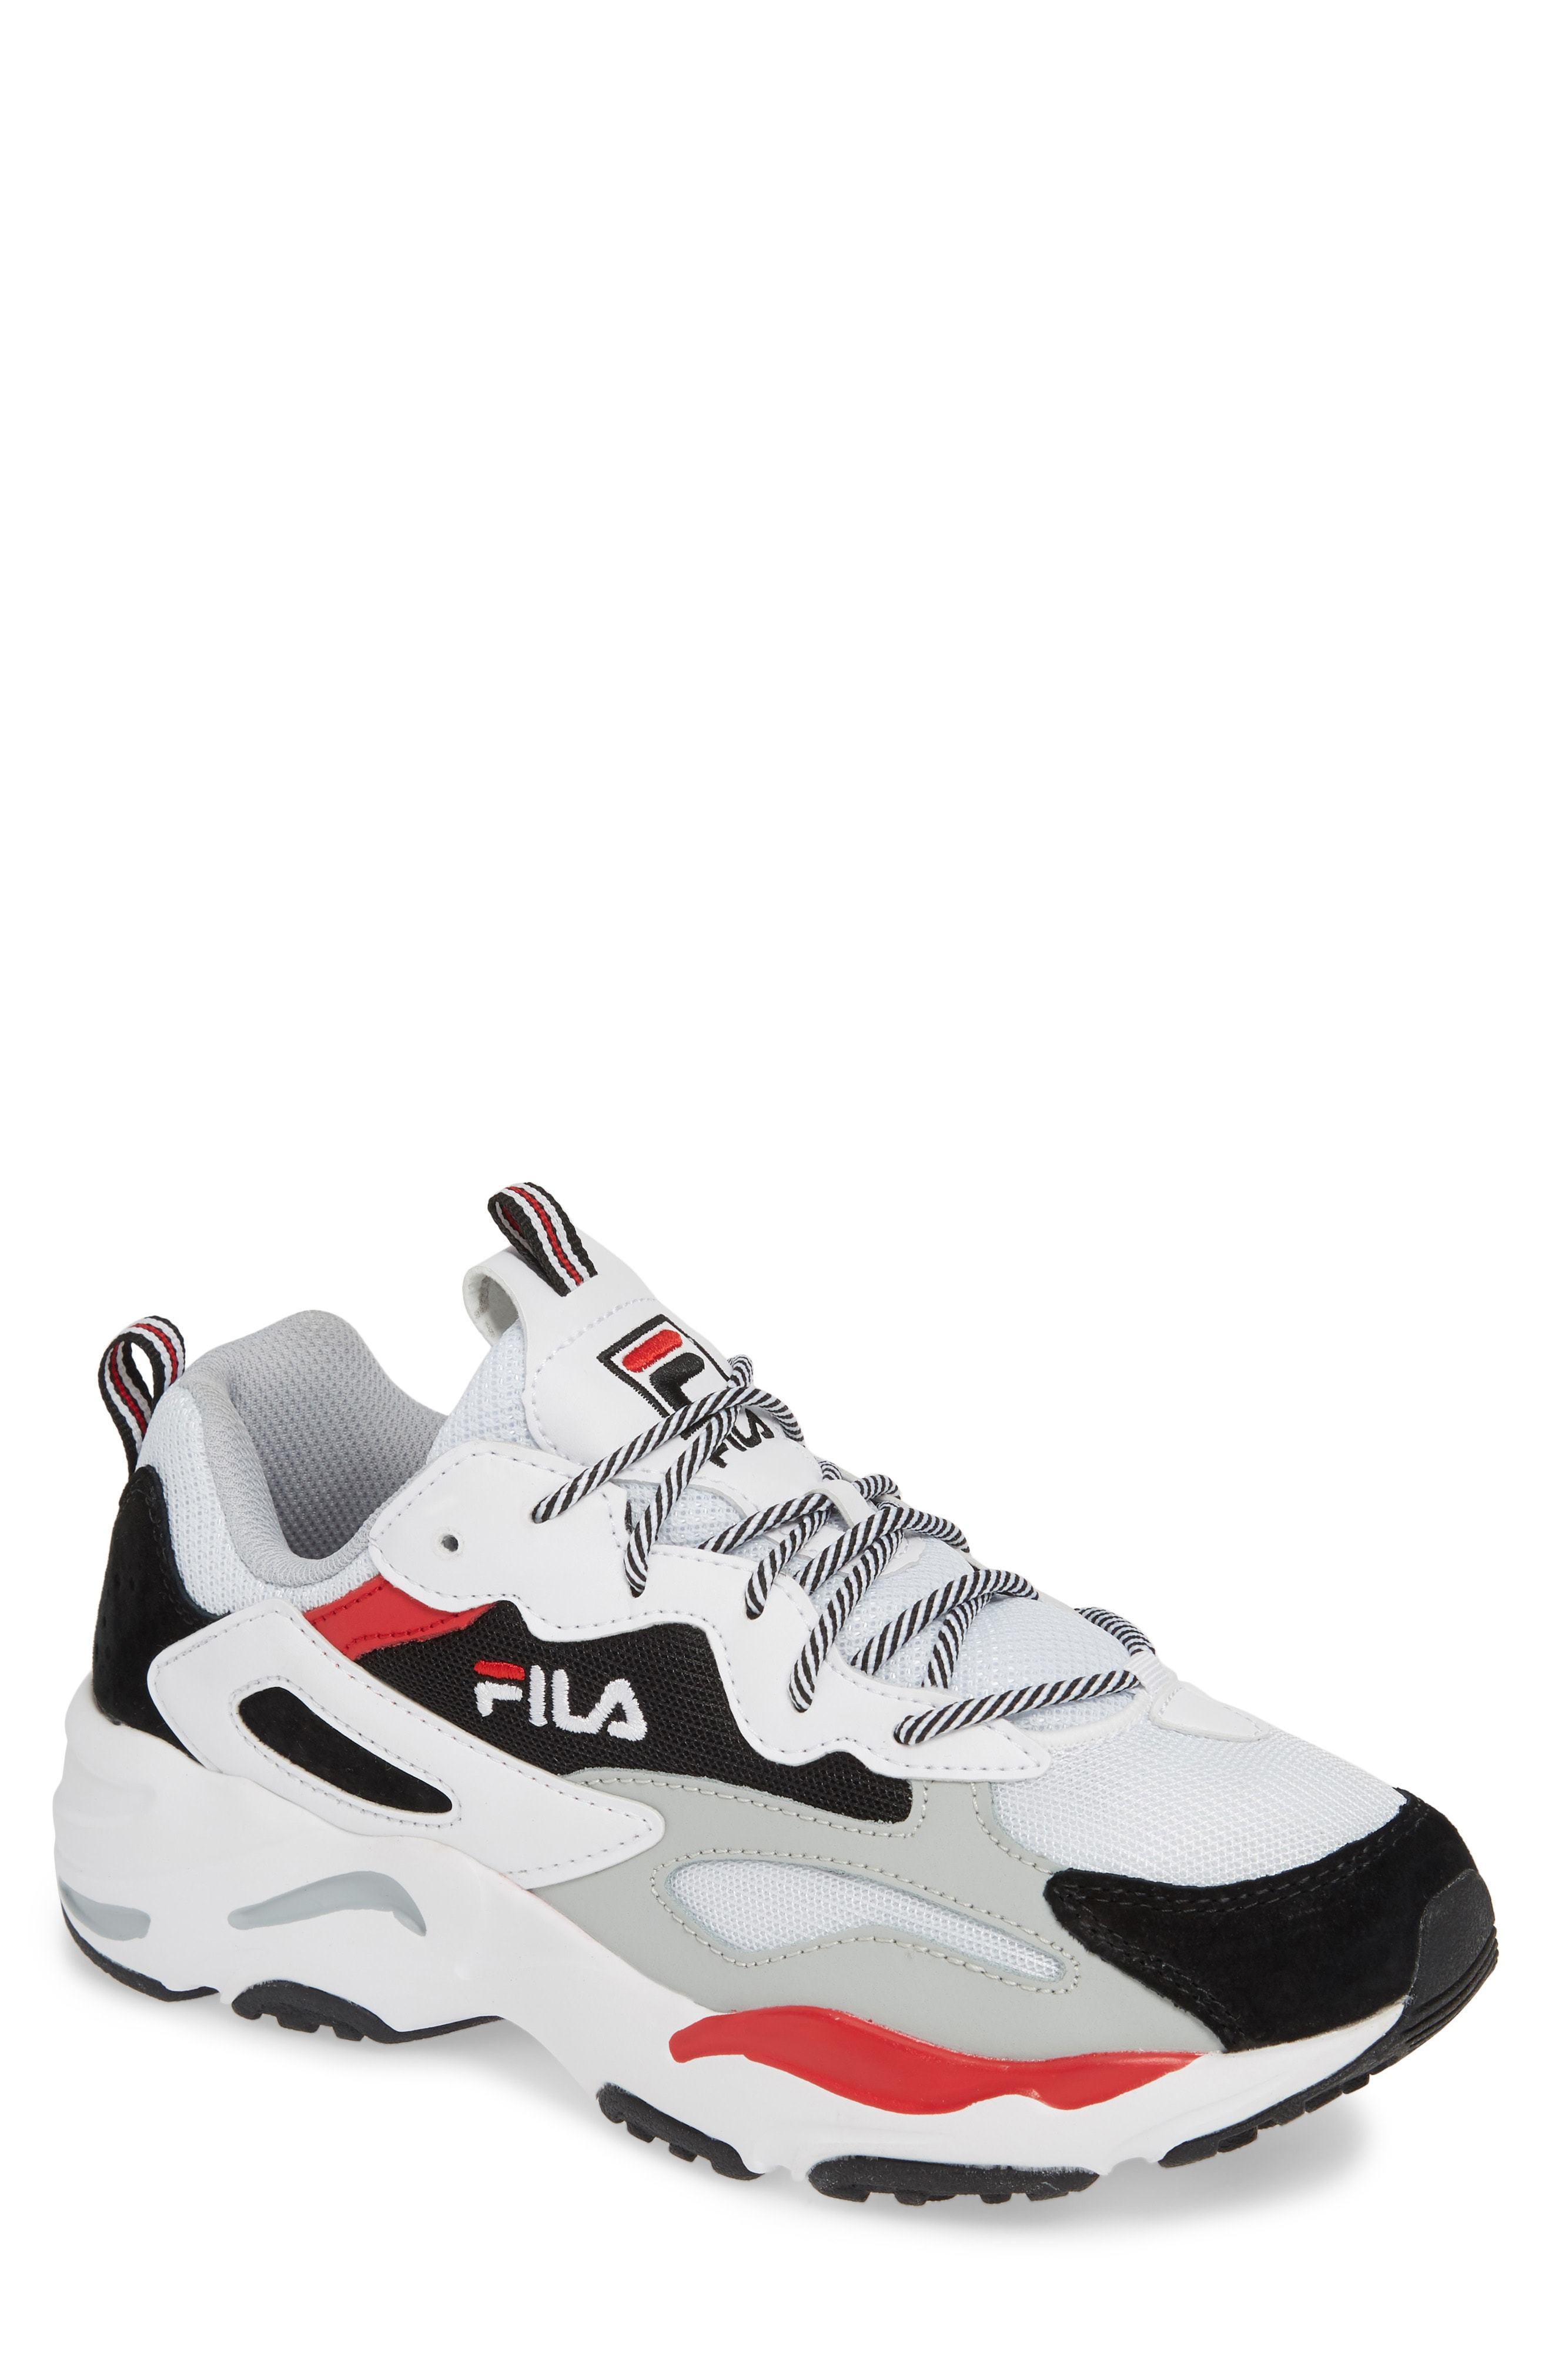 Fila Ray Tracer Sneaker, $84